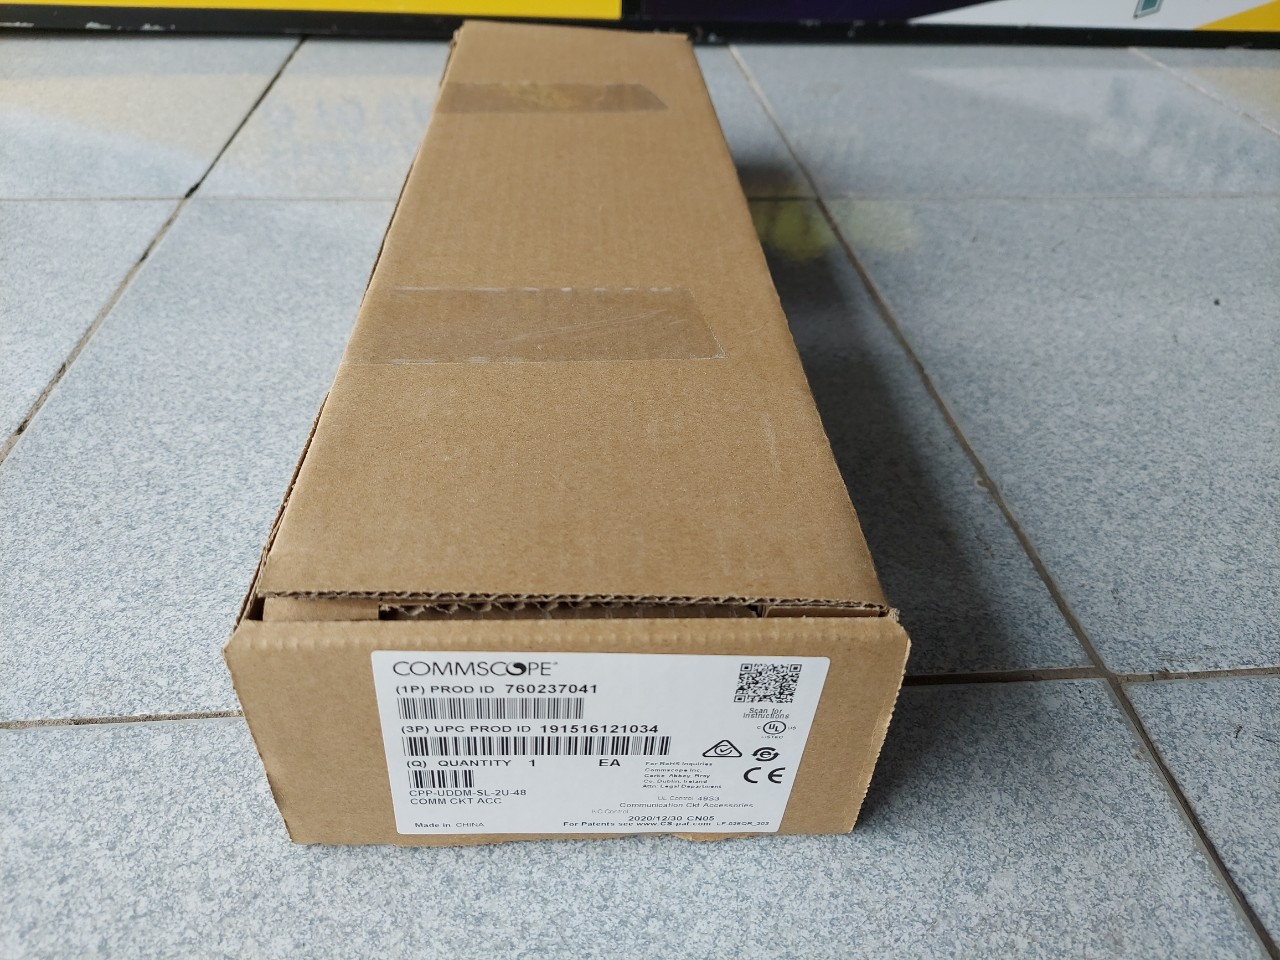 Patch Panel 48 port Cat5e Commscope 760237041, 9-1375191-2